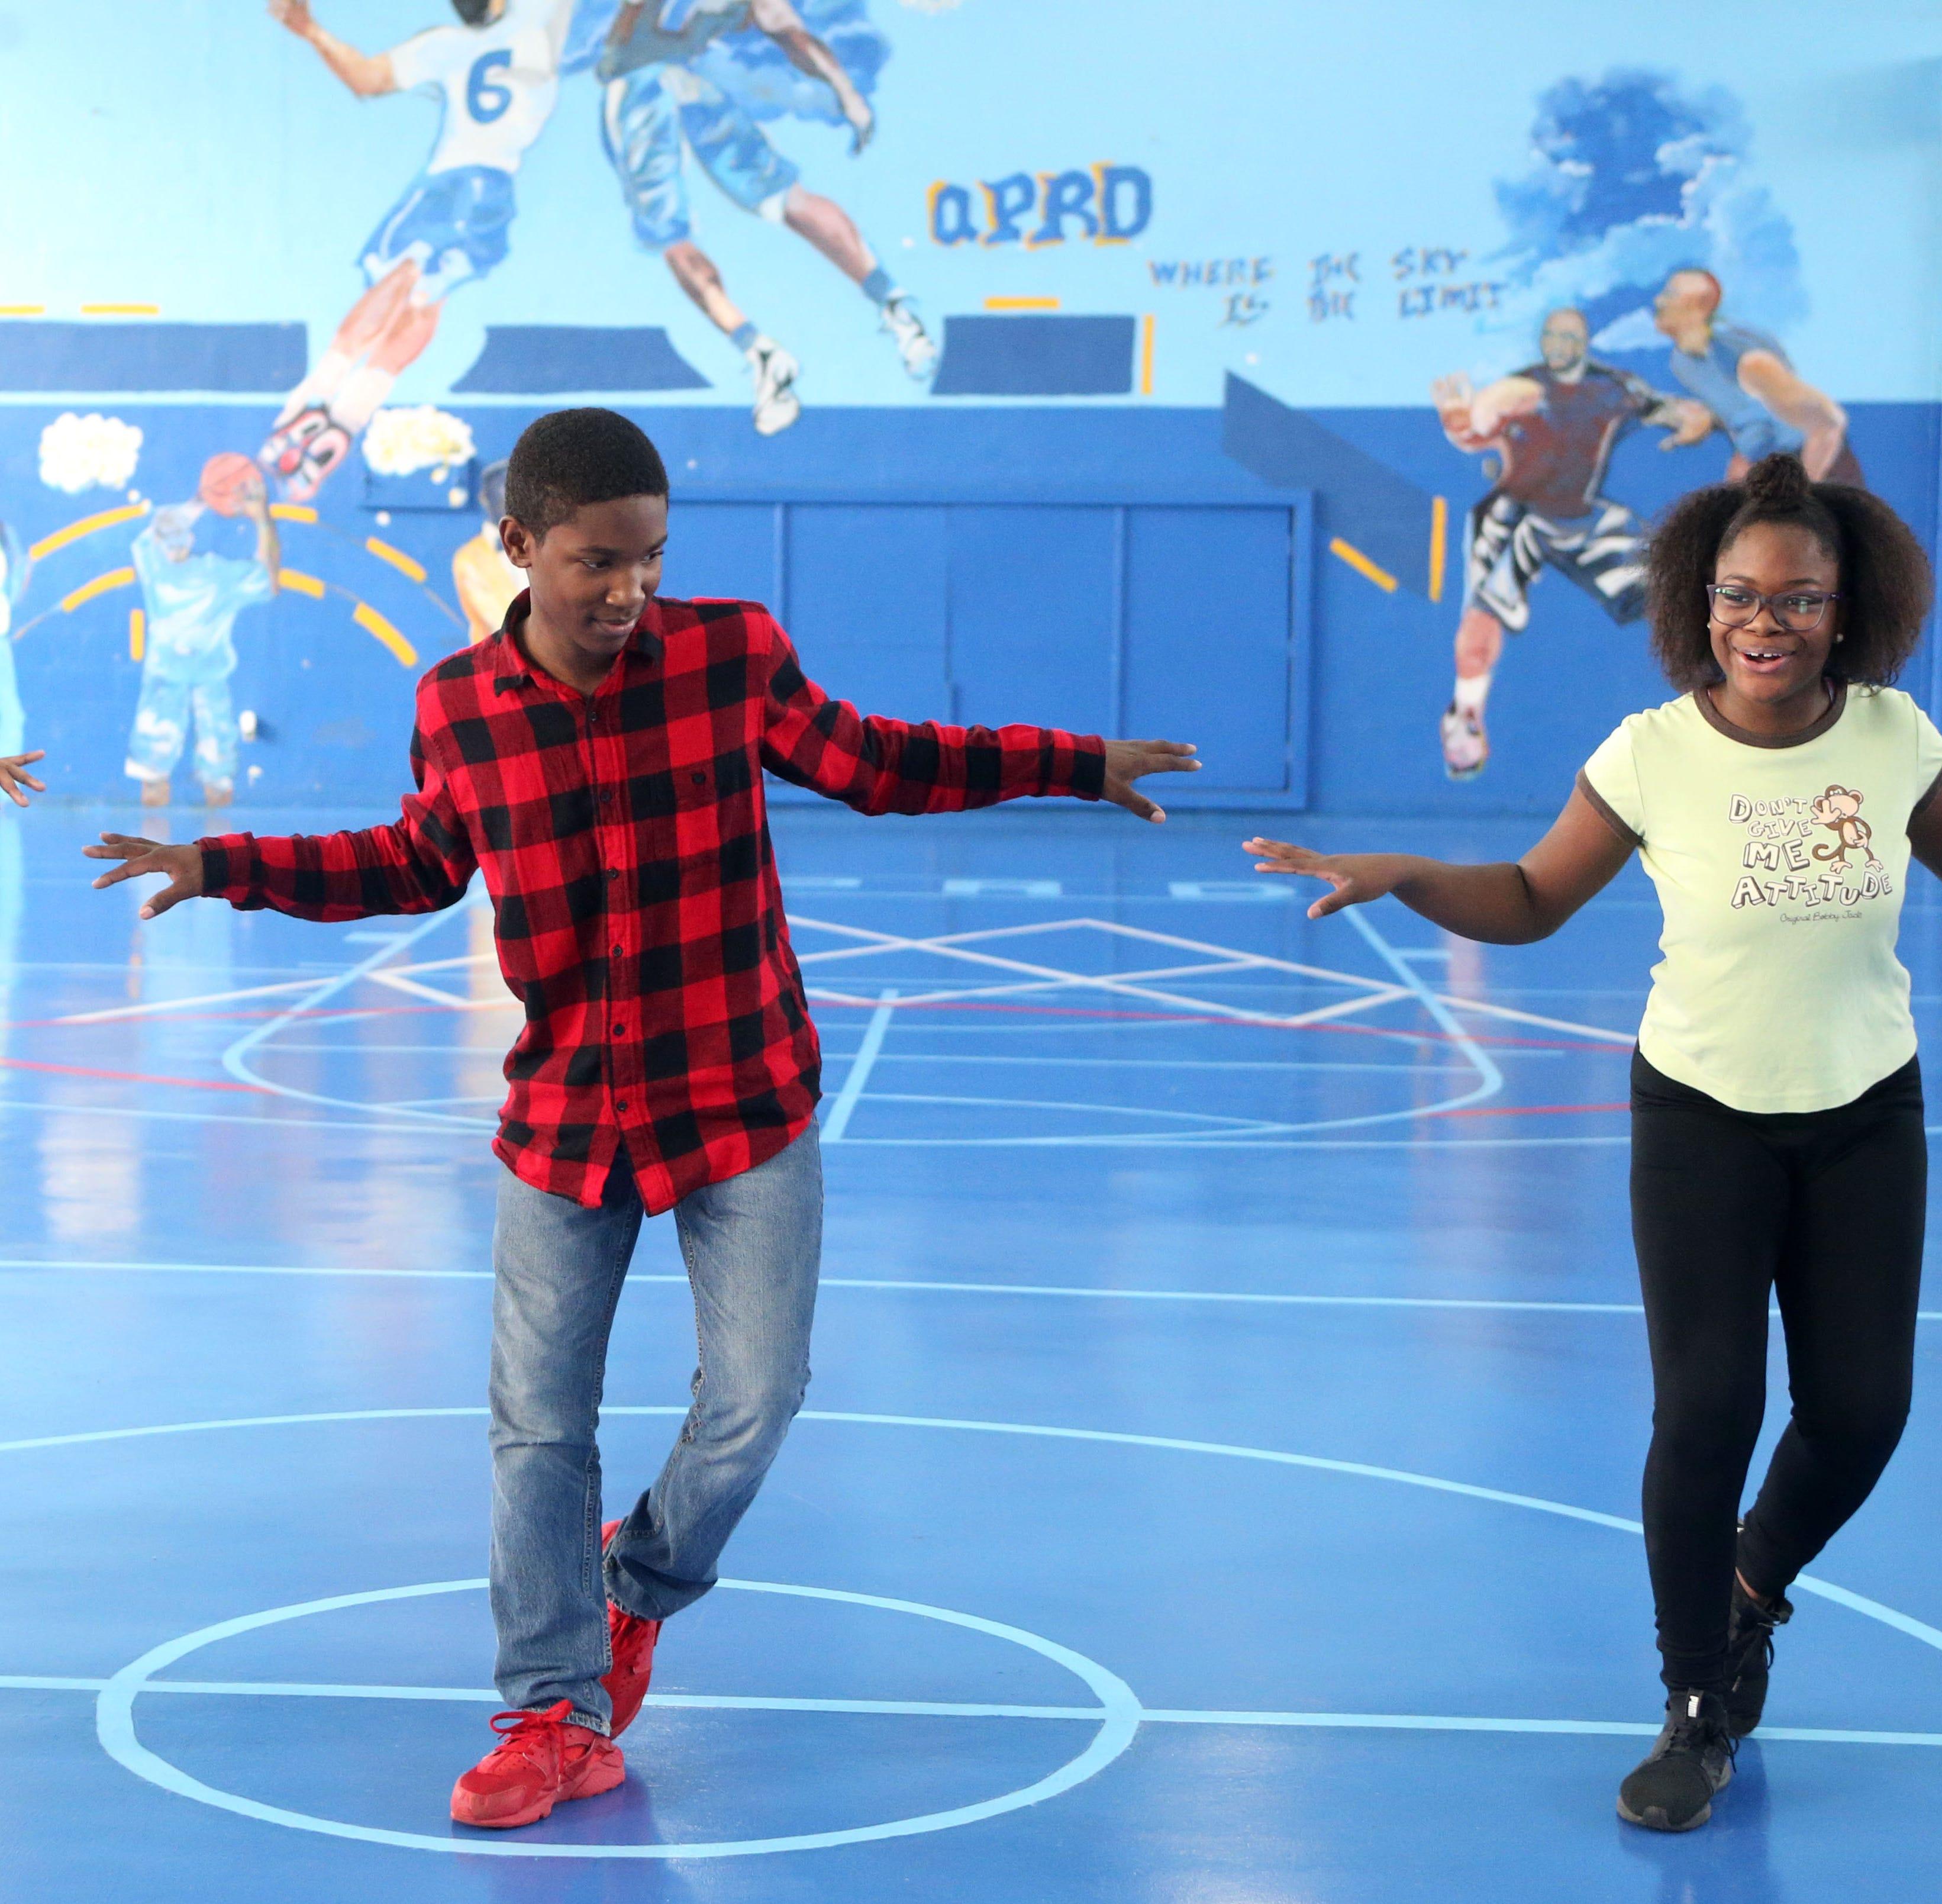 Quincy performing arts school looks to rebuild following Hurricane Michael